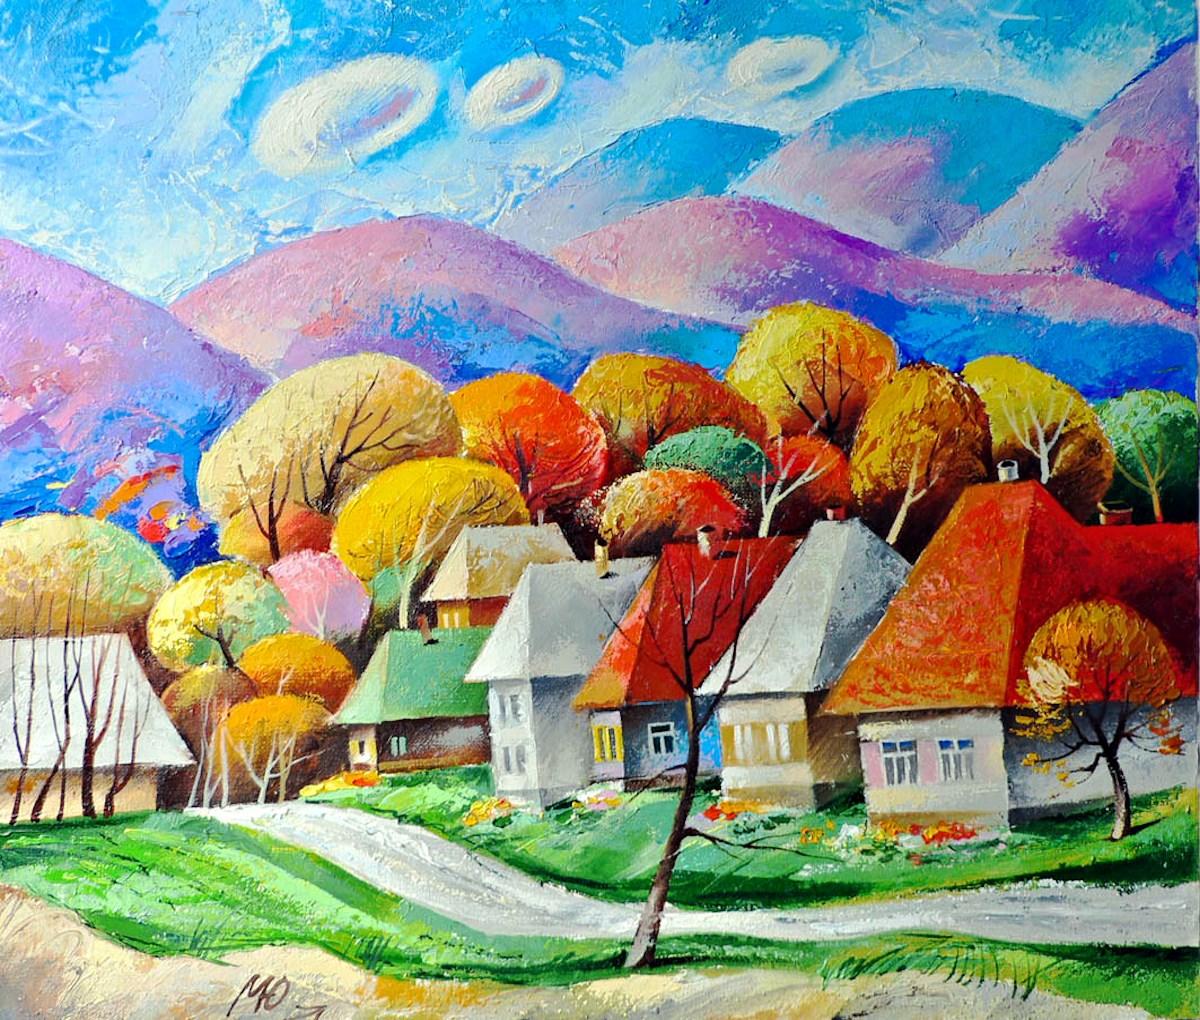 00 Yuri Matsik. Autumn in Carpatho-Russia. 2006